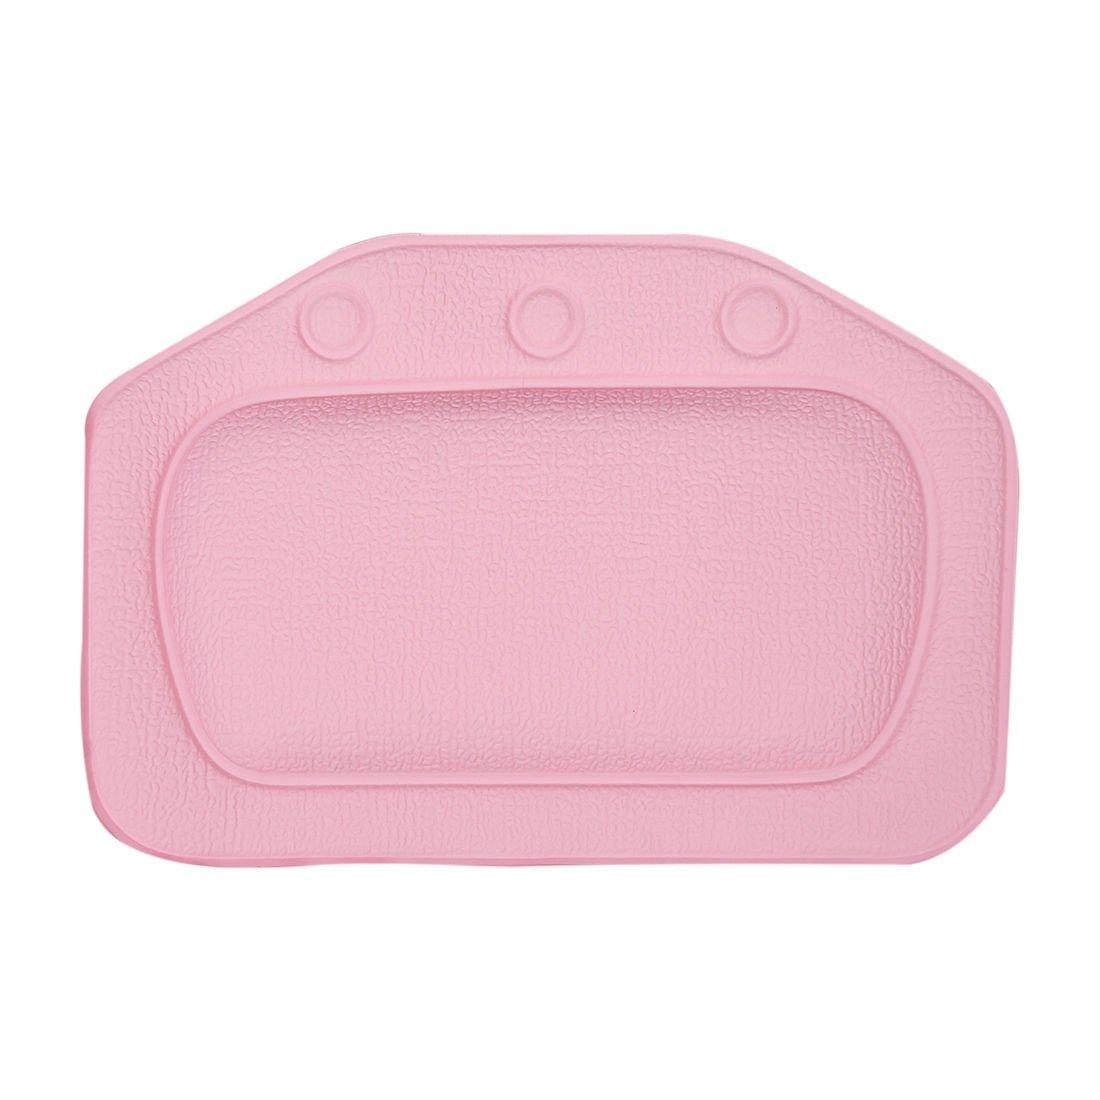 bathtub pillow - TOOGOO(R) Home & Garden Bathroom bathtub pillow bath bathtub headrest suction cup waterproof Bath Pillows Bathroom Products Pink 097174A3